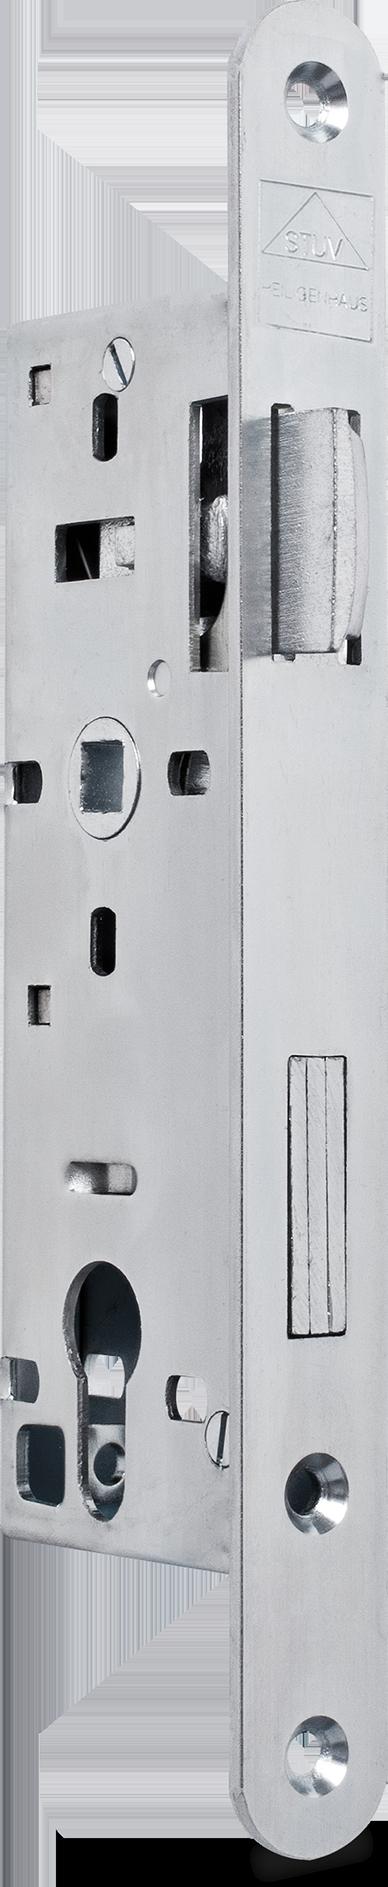 Einsteckschloss mit Wechsel, Dornmaß 35 mm, Entfernung 72 mm, Vierkantnuss 9 mm, Falle und Riegel bündig, DIN links (Falle nach Öffnen des Schlosses umlegbar)